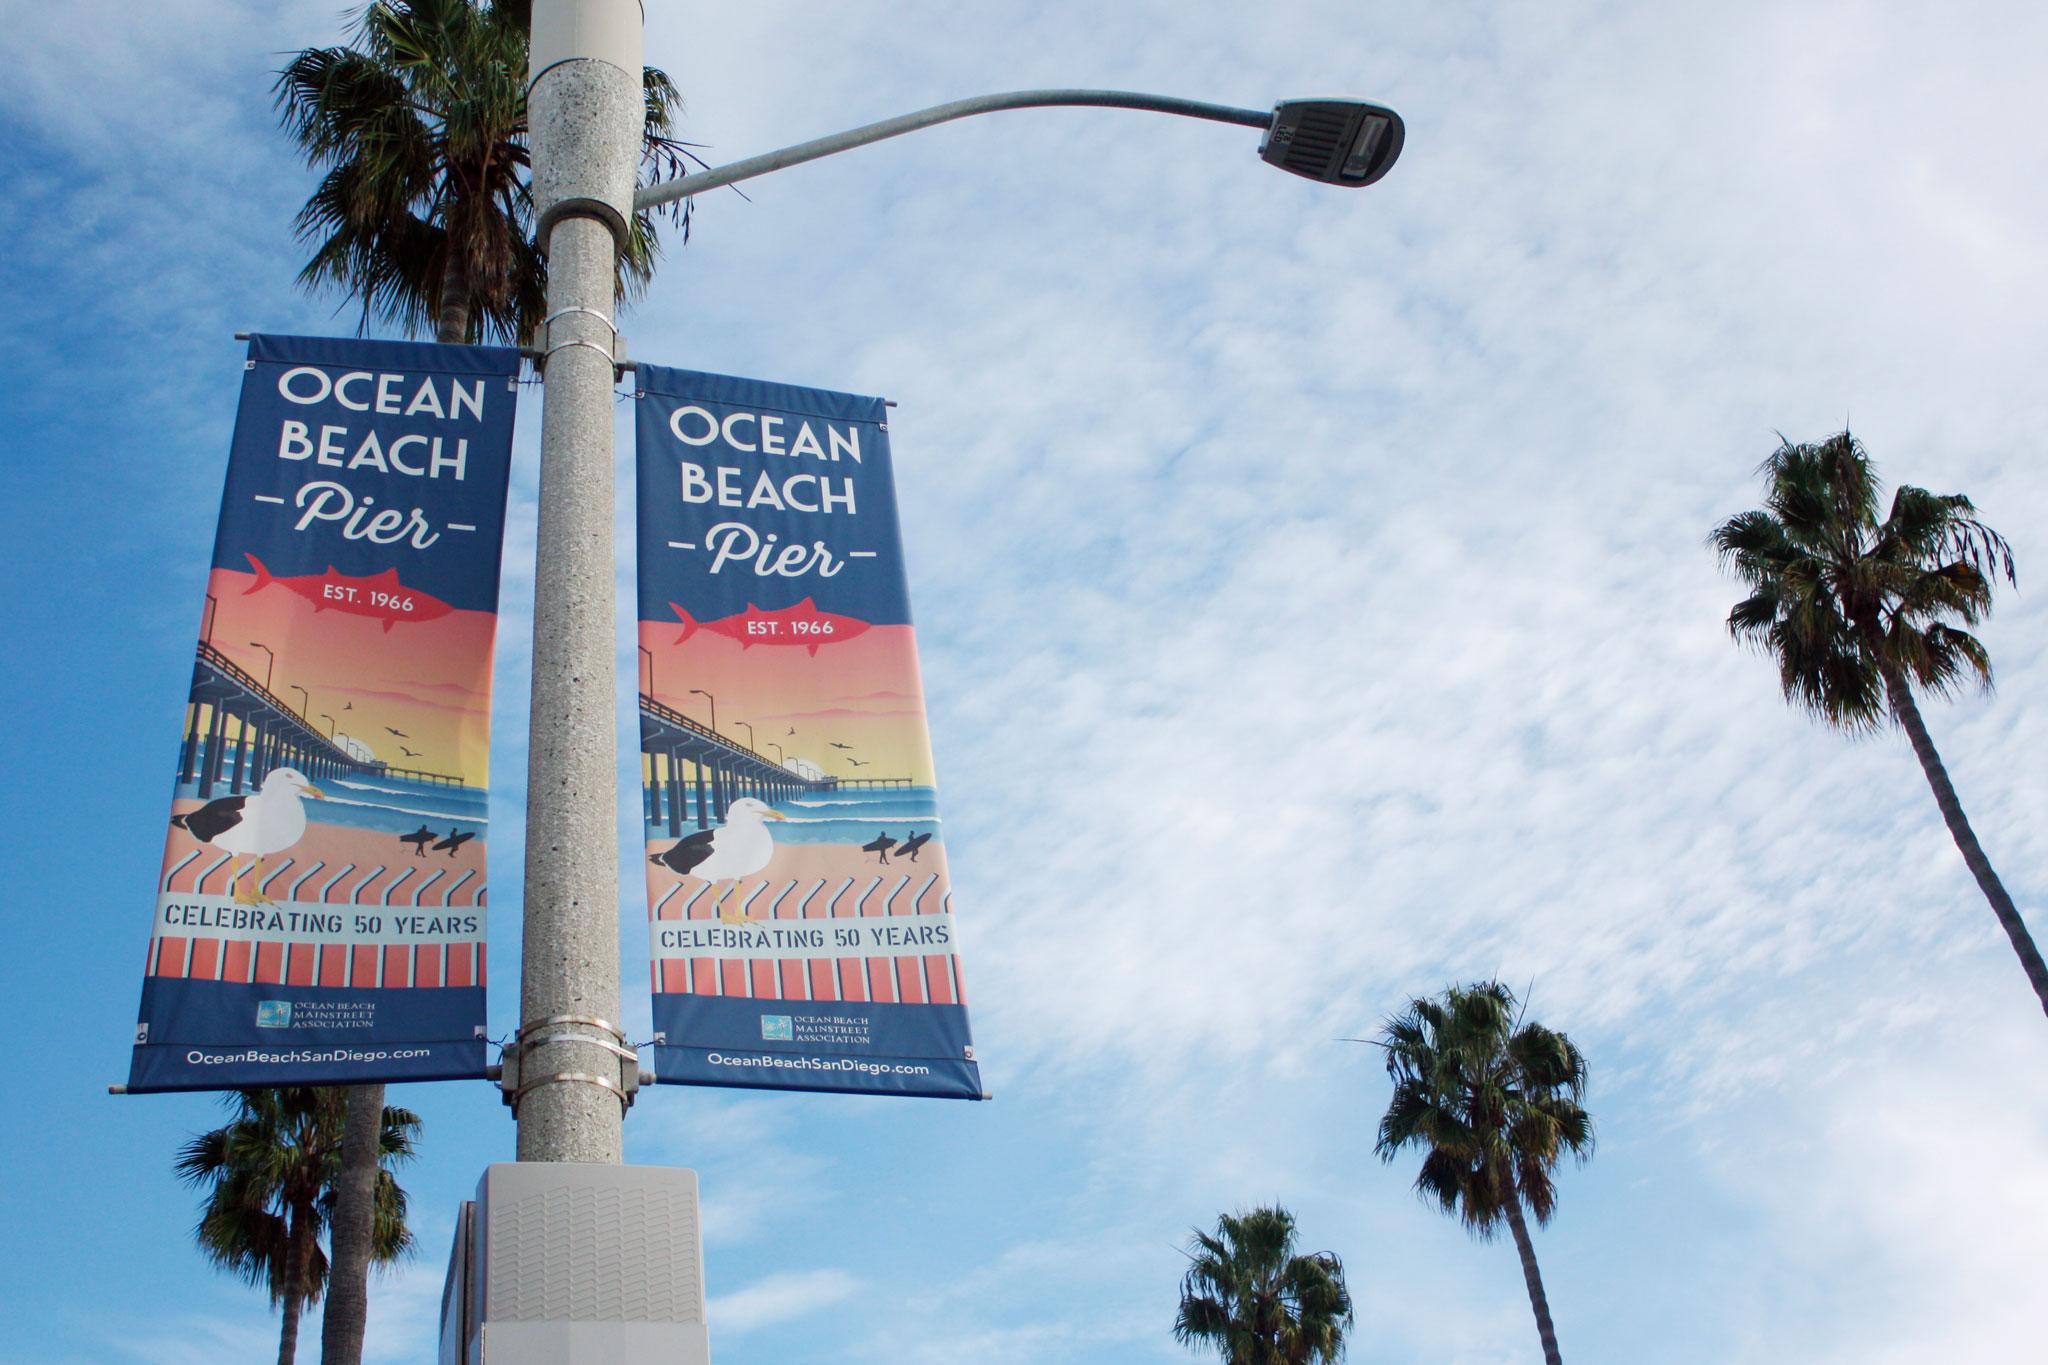 Ocean Beach Pier 50th Anniversary street banners by Ashley Lewis